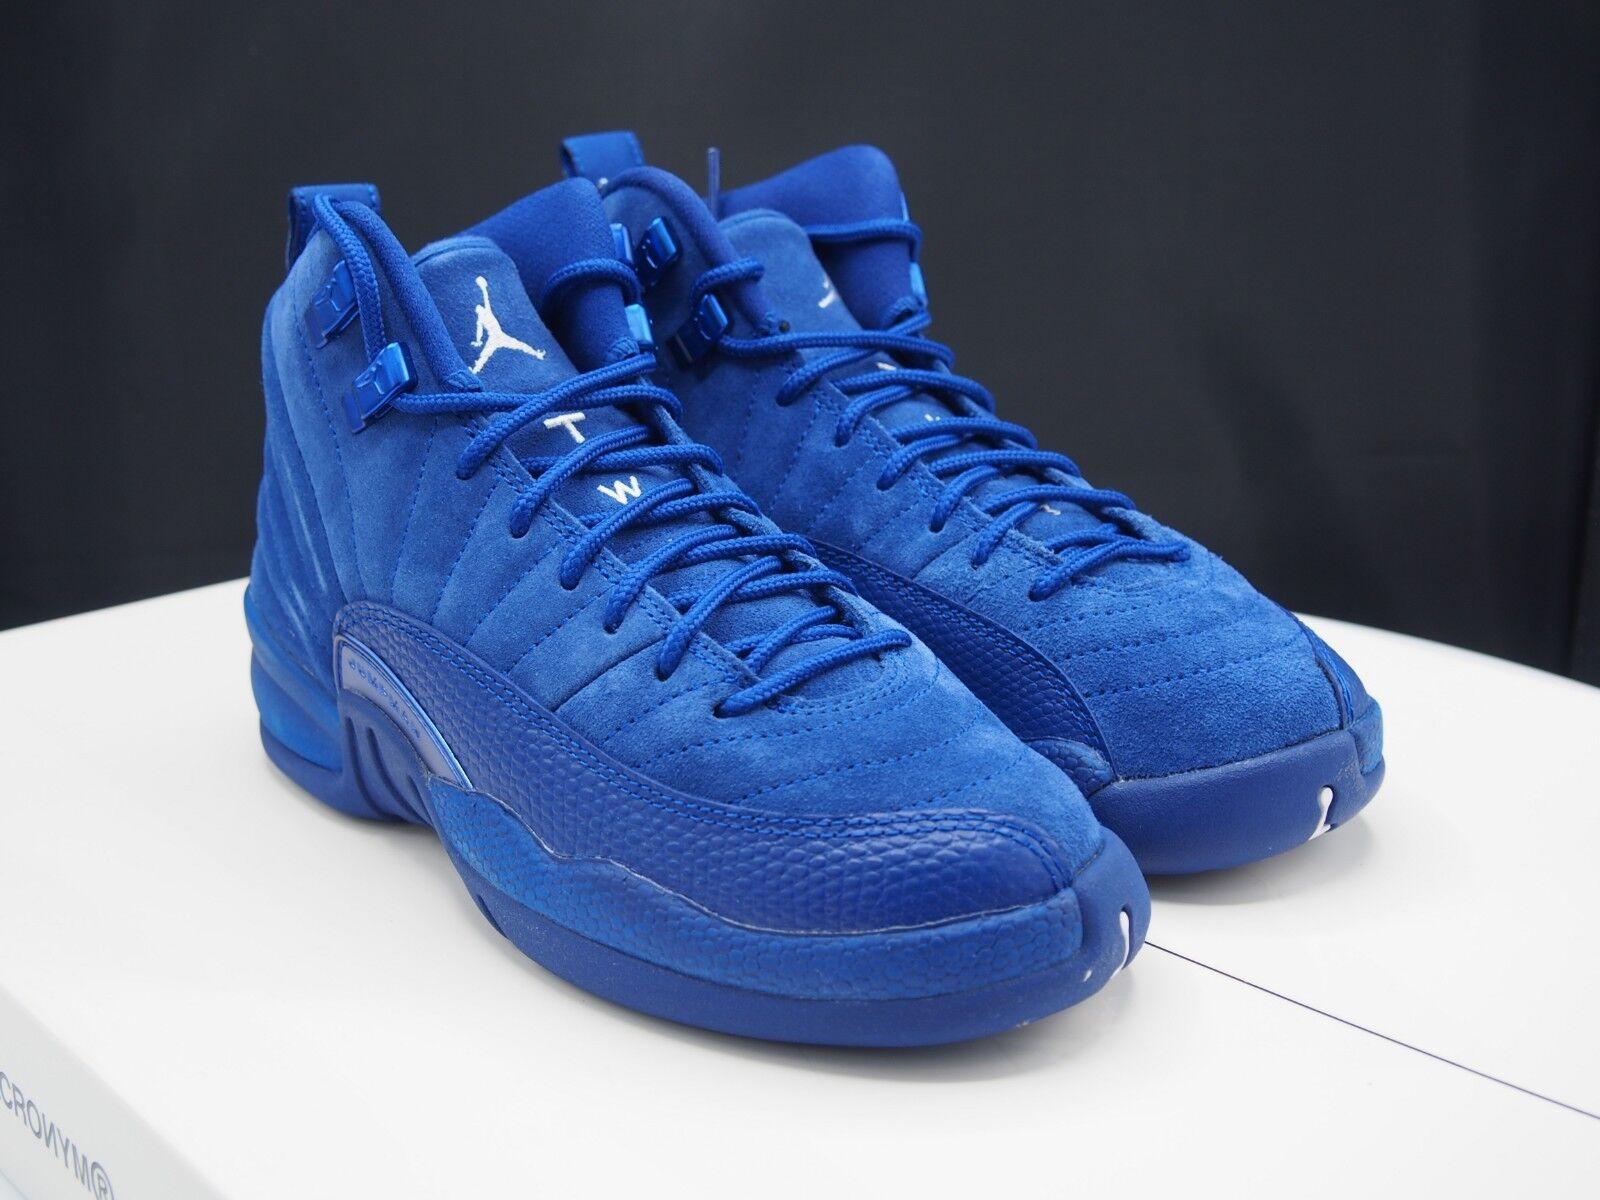 new style 3f6b7 4bd18 Air Jordan 12 Retro GS Big Kids 153265-400 Deep Royal Blue Suede Shoes Size  4